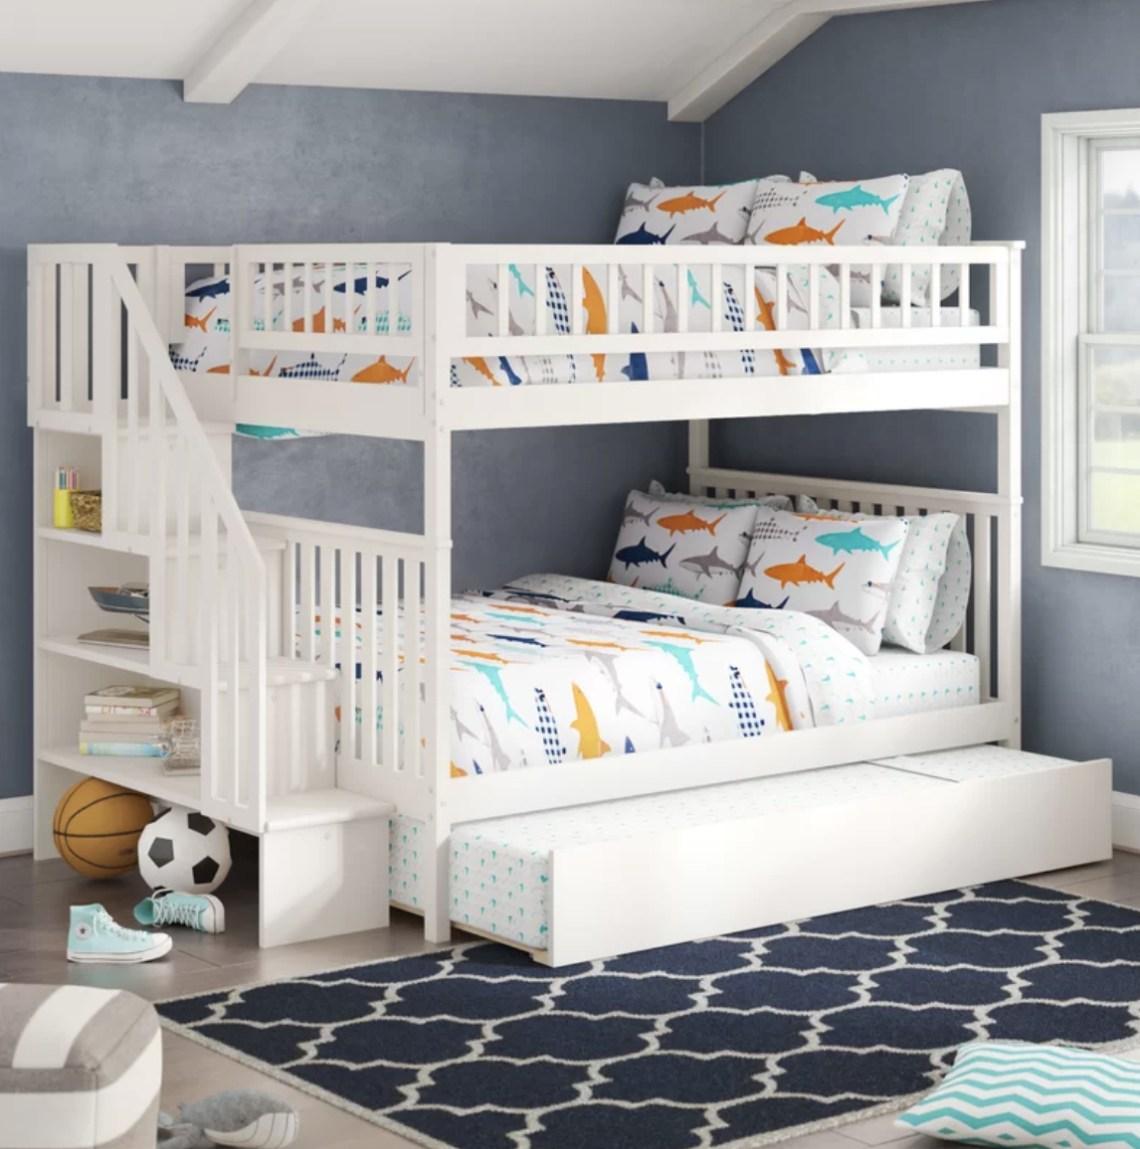 27 Fun Bunk Beds For Kids